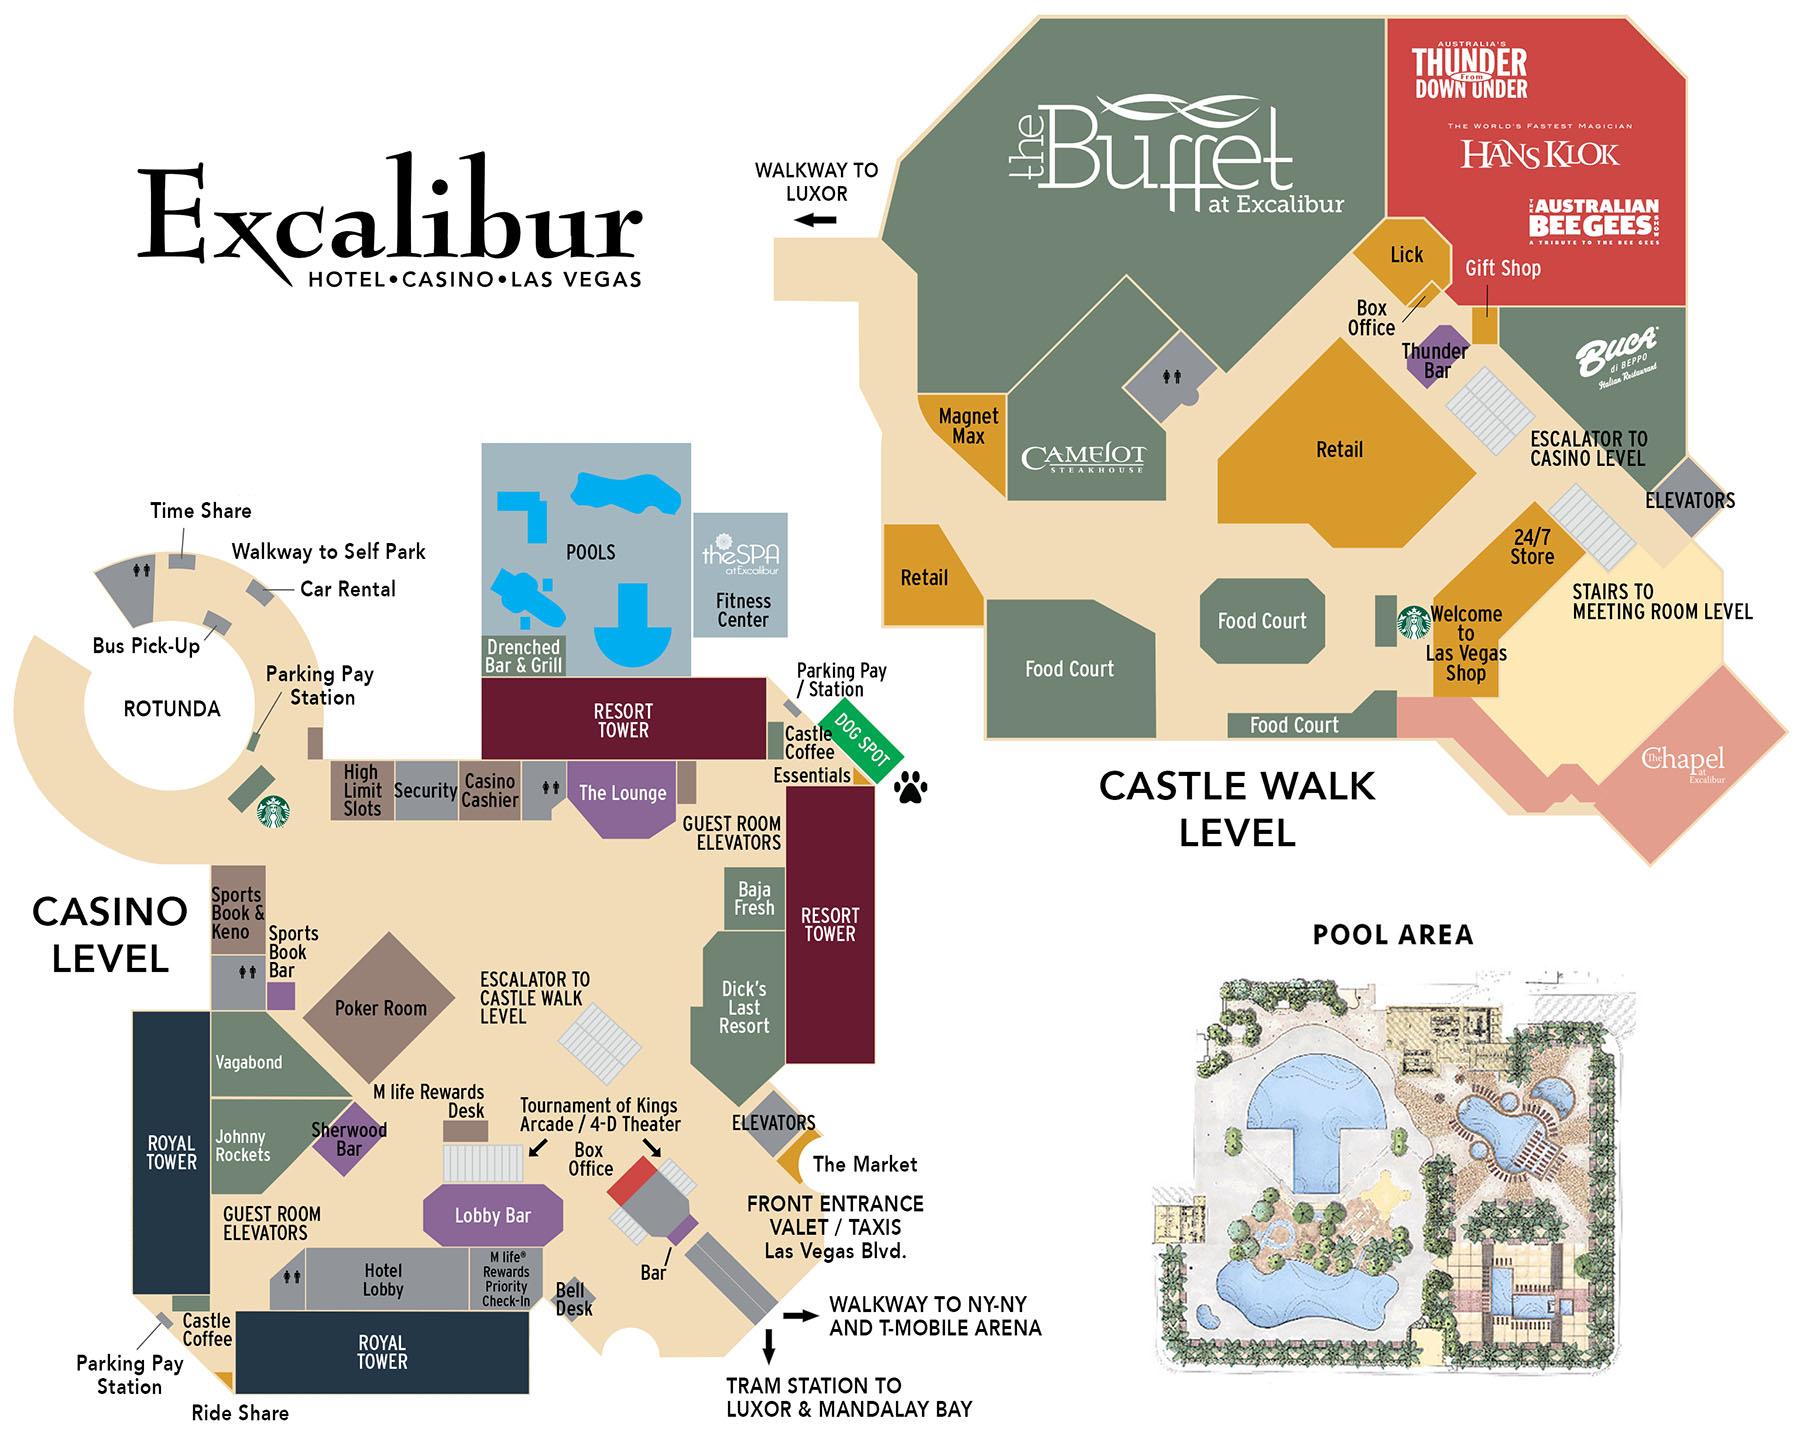 Excalibur Casino Property Map Amp Floor Plans Las Vegas